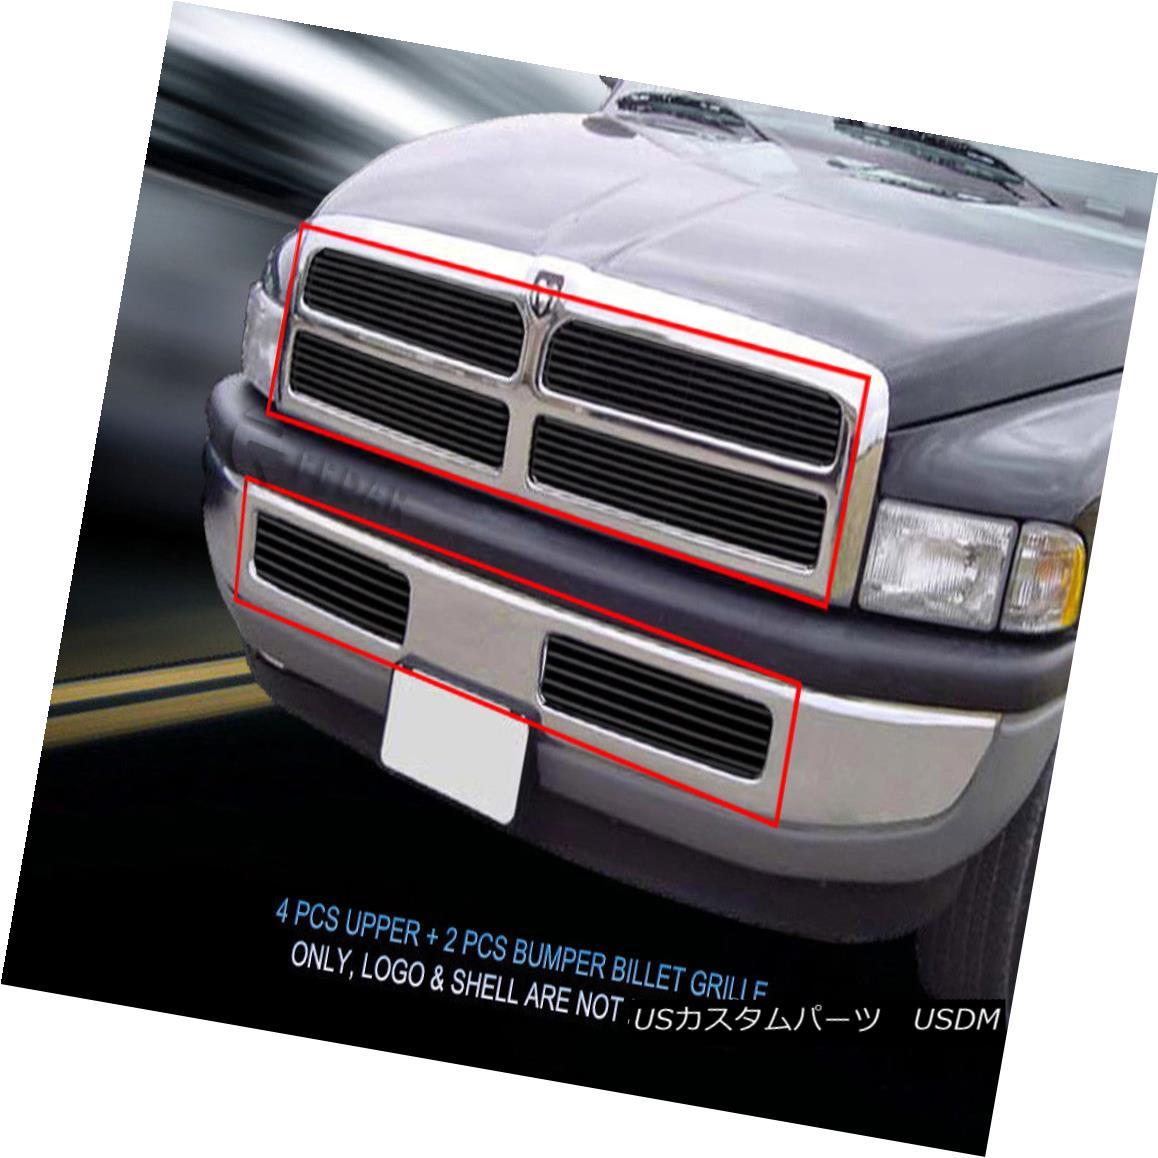 USグリル 94-01 Dodge Ram Billet Black Grille Grill Combo Insert  Fedar 94-01 Dodge Ram BilletブラックグリルグリルコンボインサートFedar